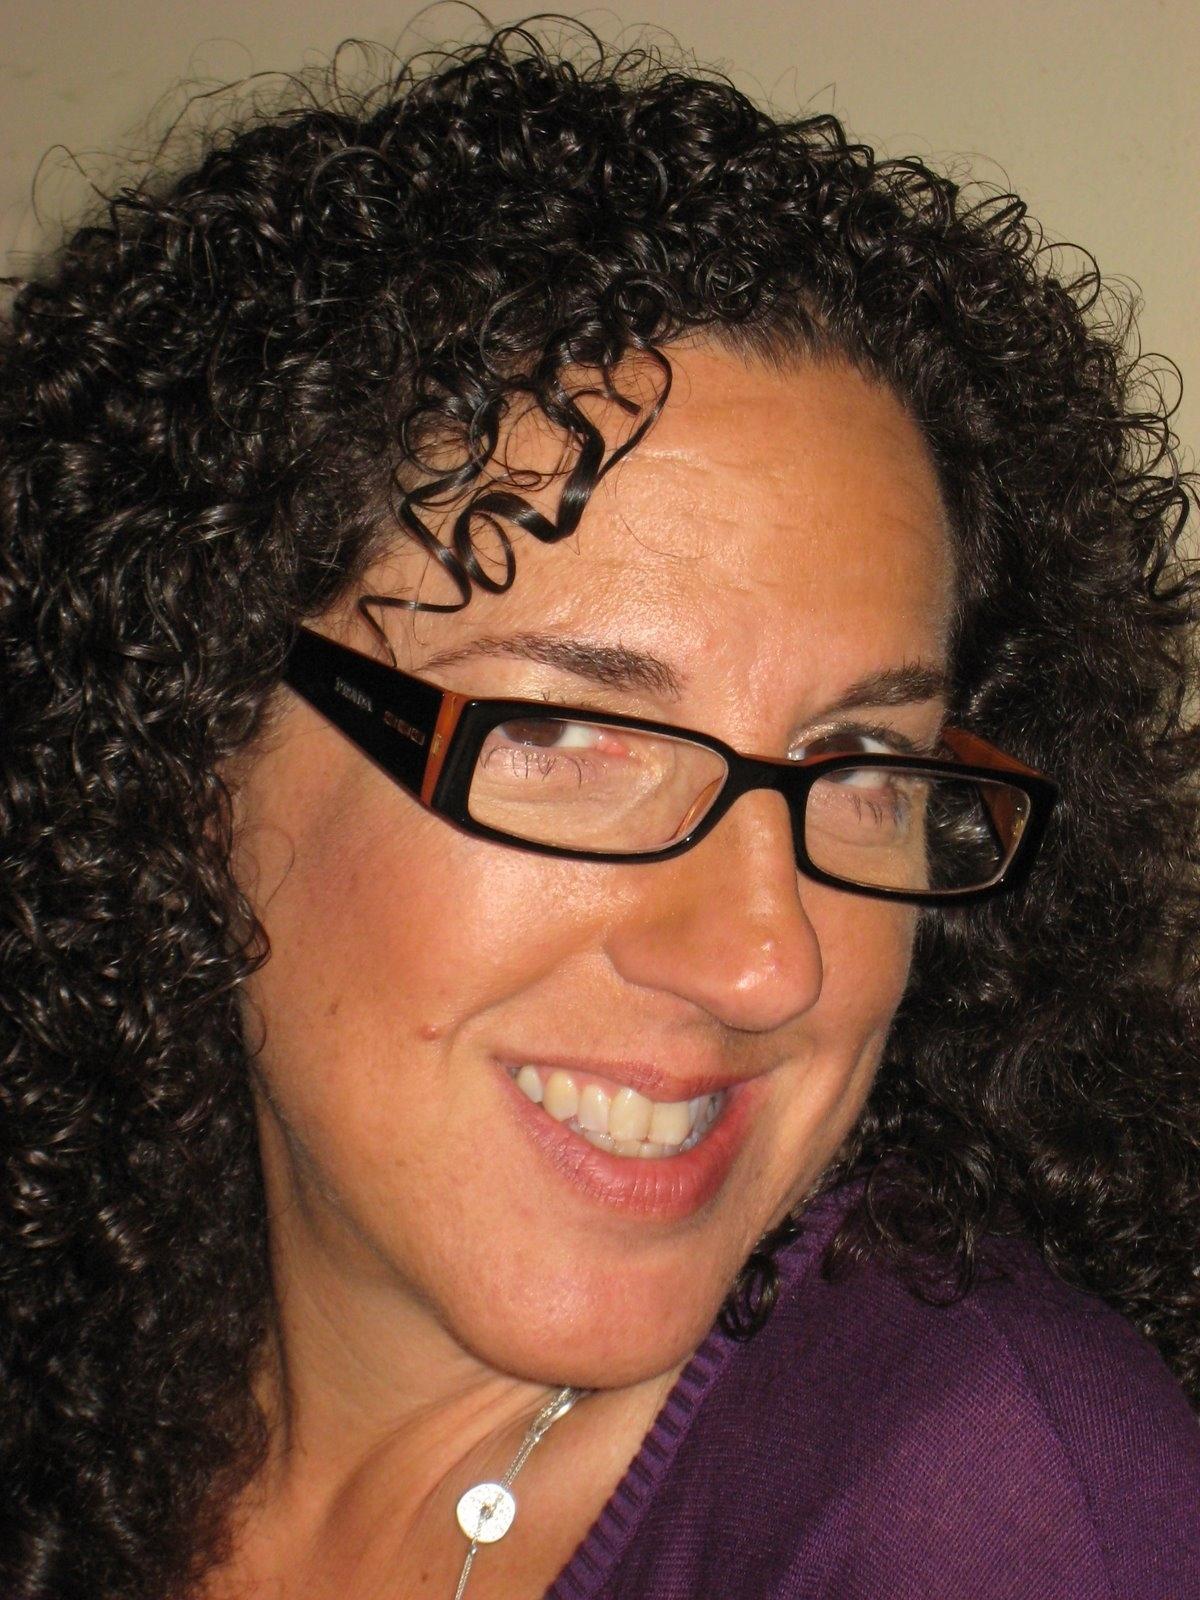 Phyllis Shapiro - Copy.JPG